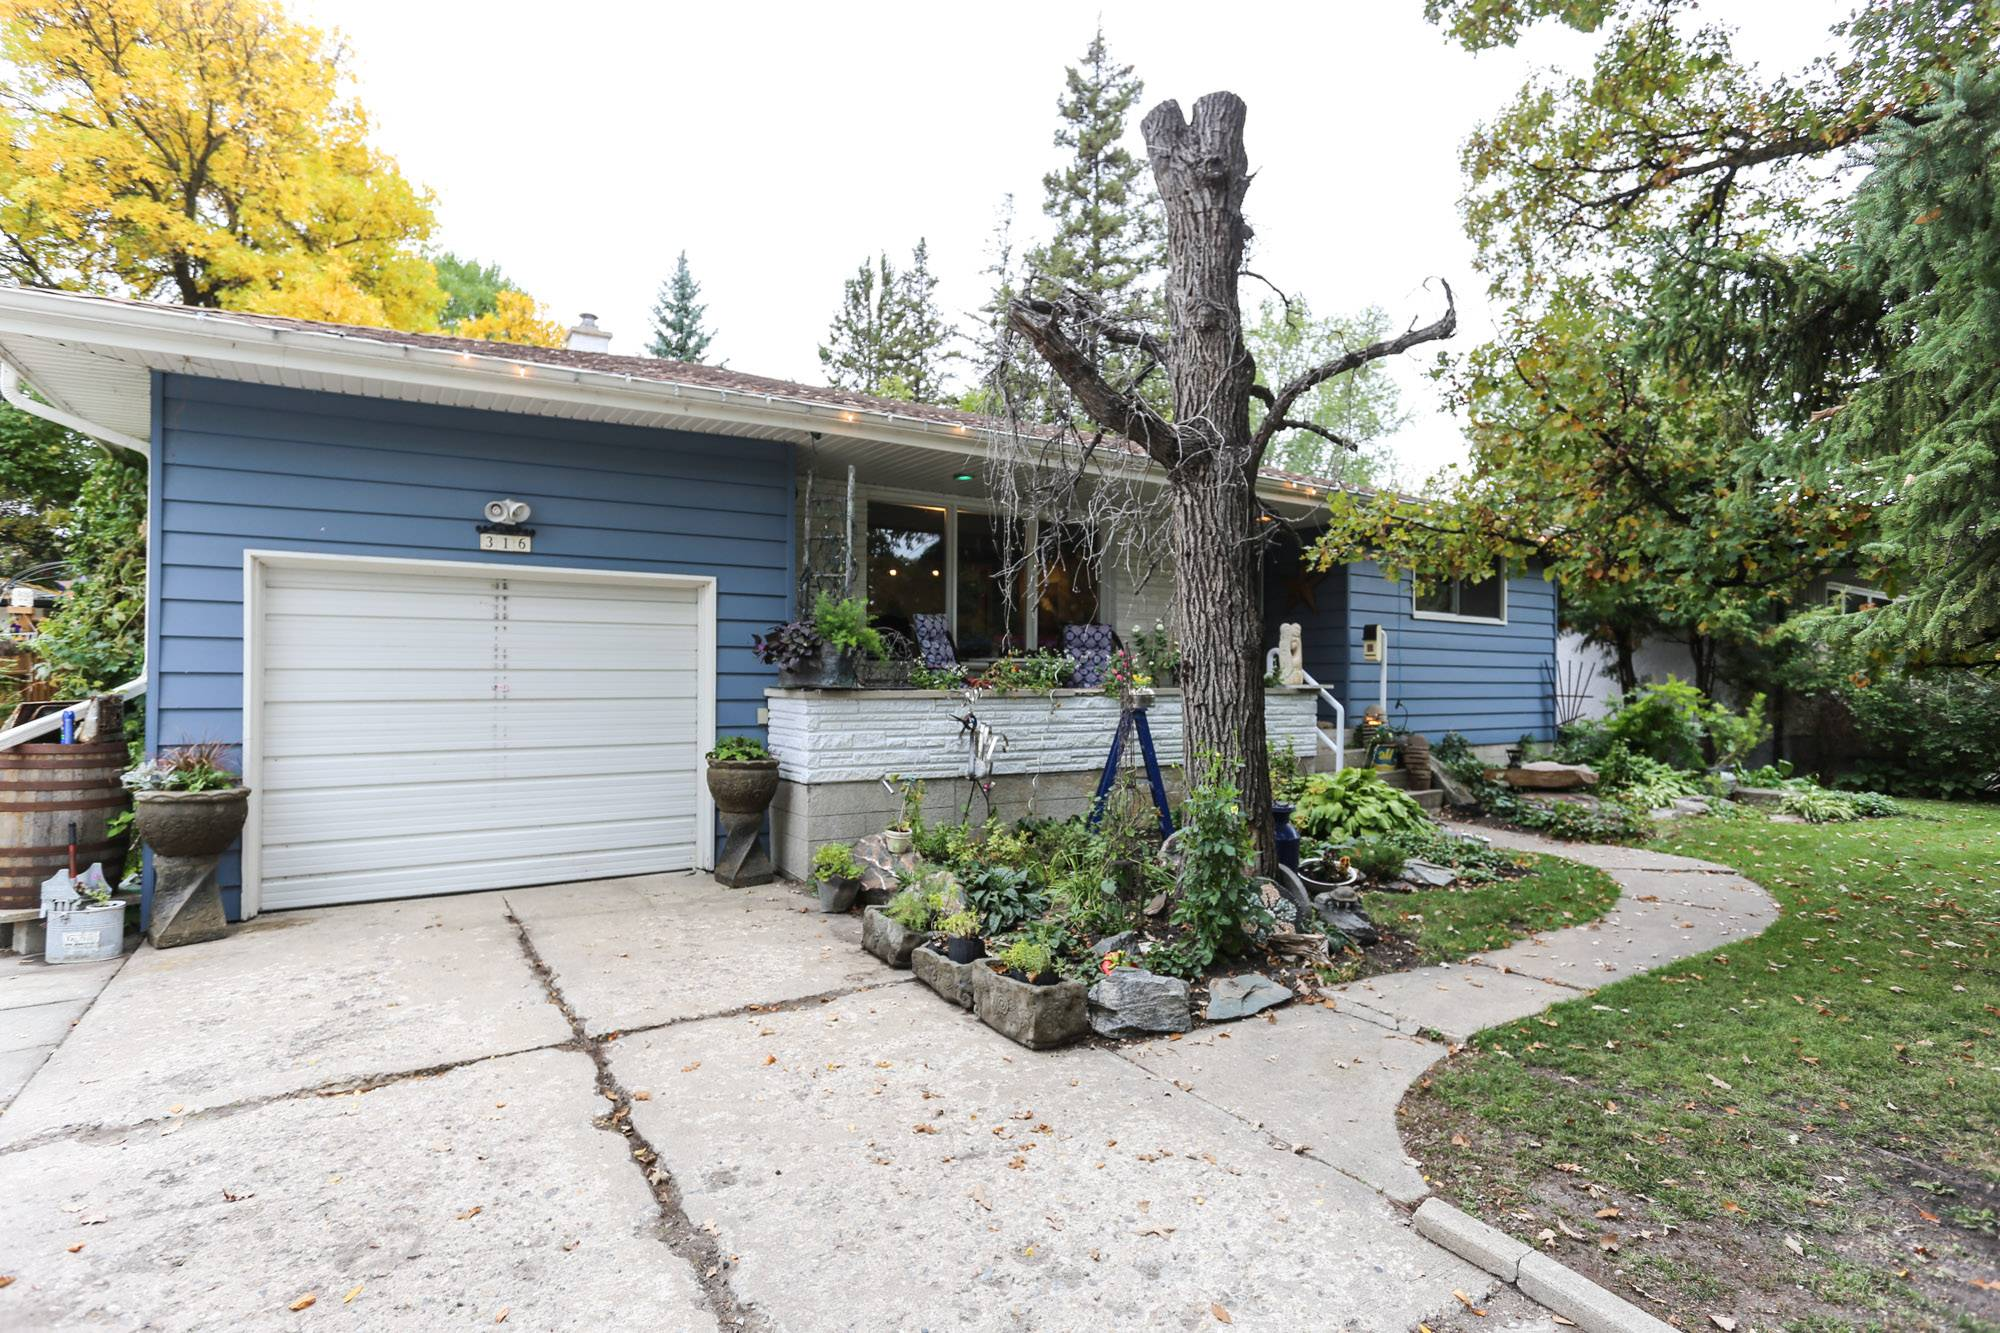 316 Bonner Ave, Winnipeg, Manitoba  R2G 1B5 - Photo 1 - 1825981